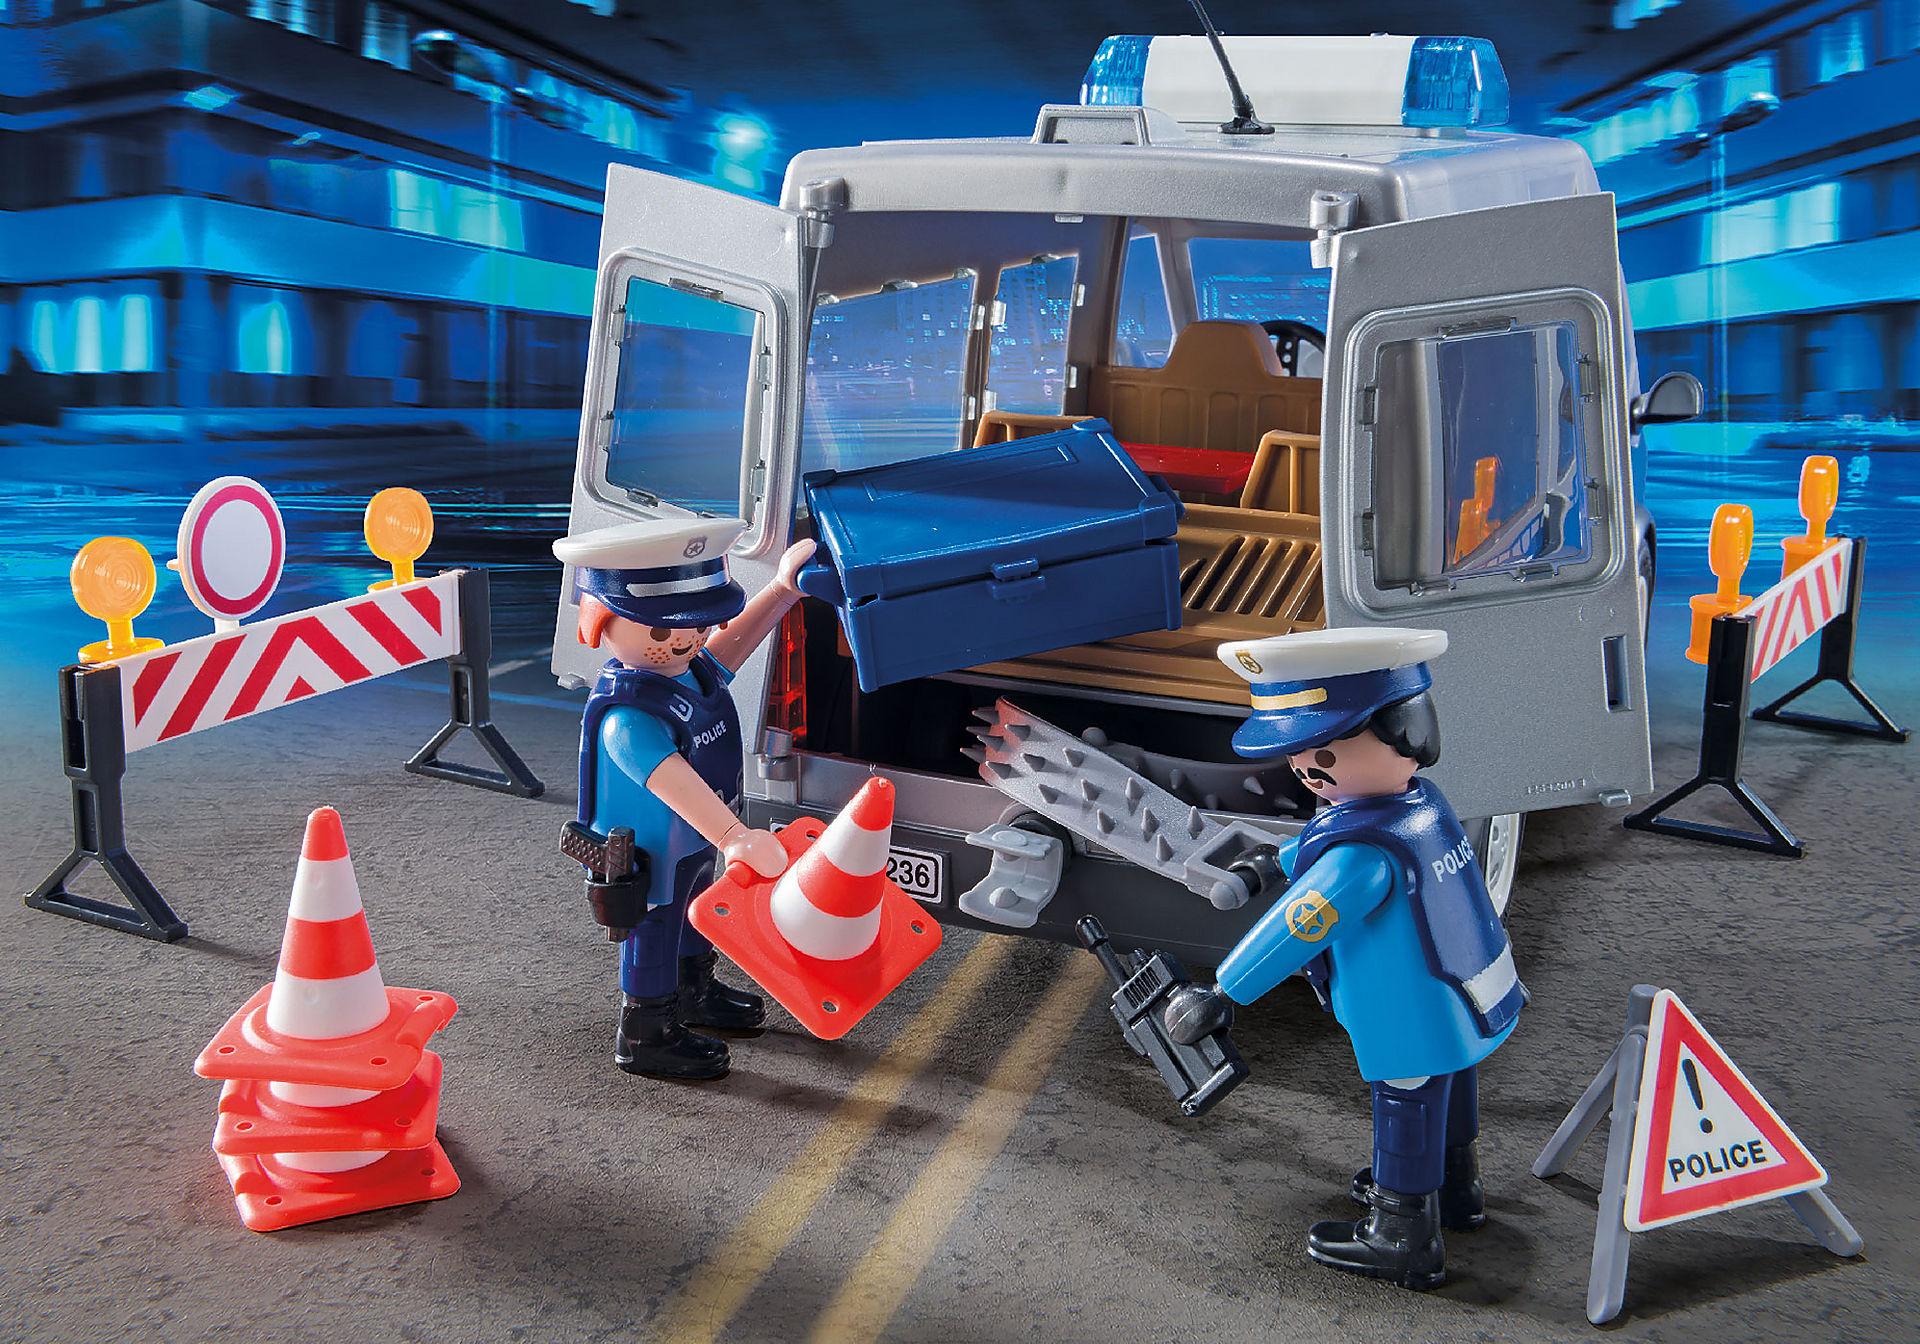 http://media.playmobil.com/i/playmobil/9236_product_extra1/Polizeibus mit Straßensperre